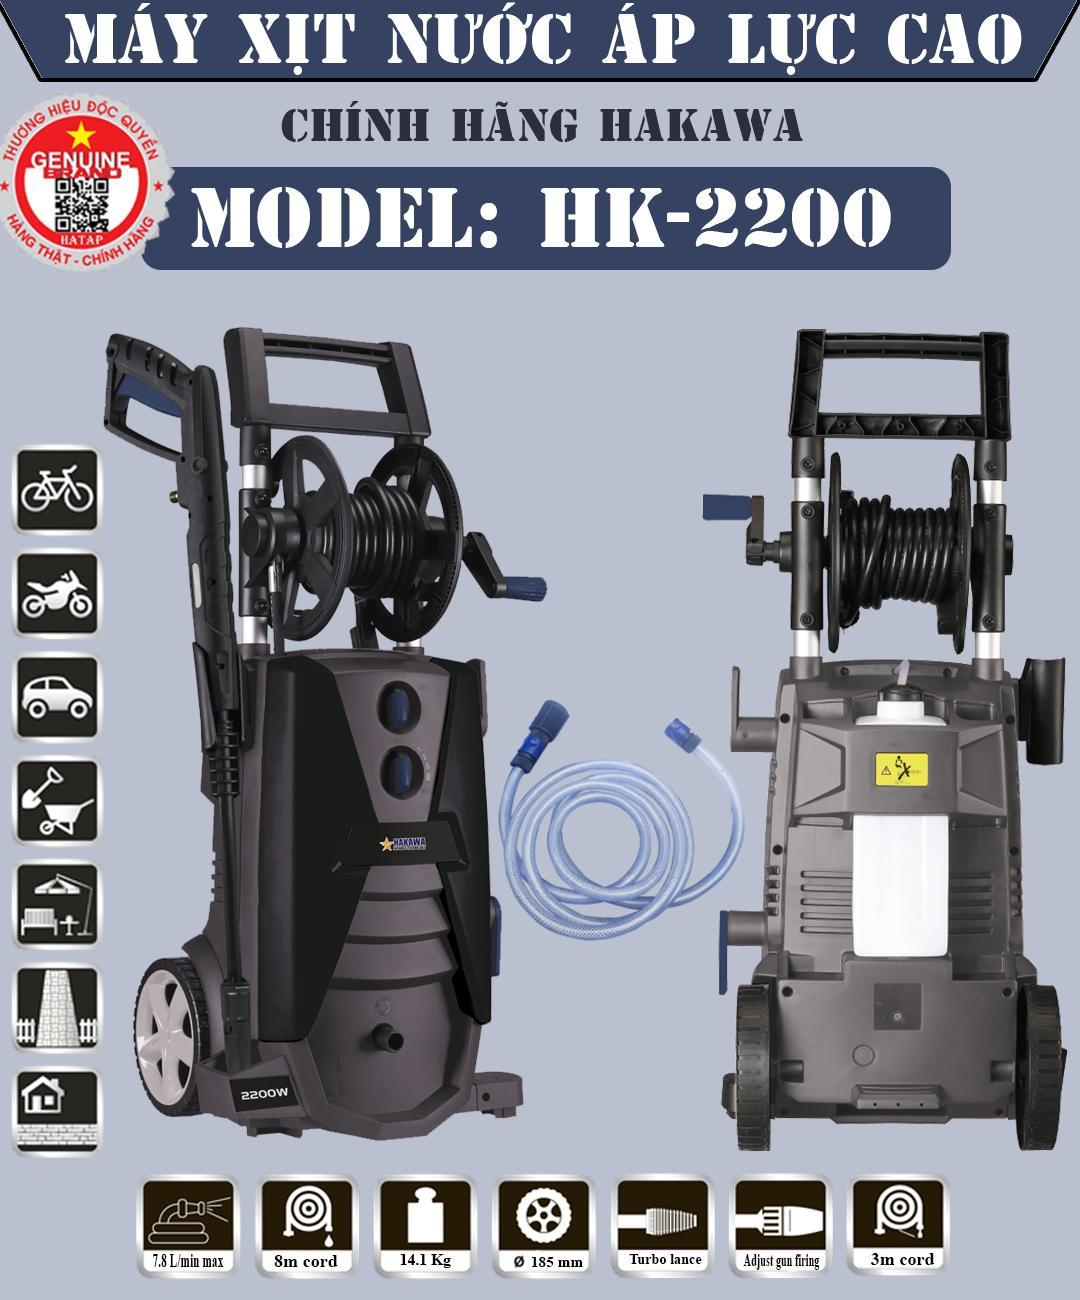 Máy Xịt Rửa Chính Hãng HAKAWA HK-2200W - Máy xịt rửa chuyên dụng cho thợ chuyên nghiệp